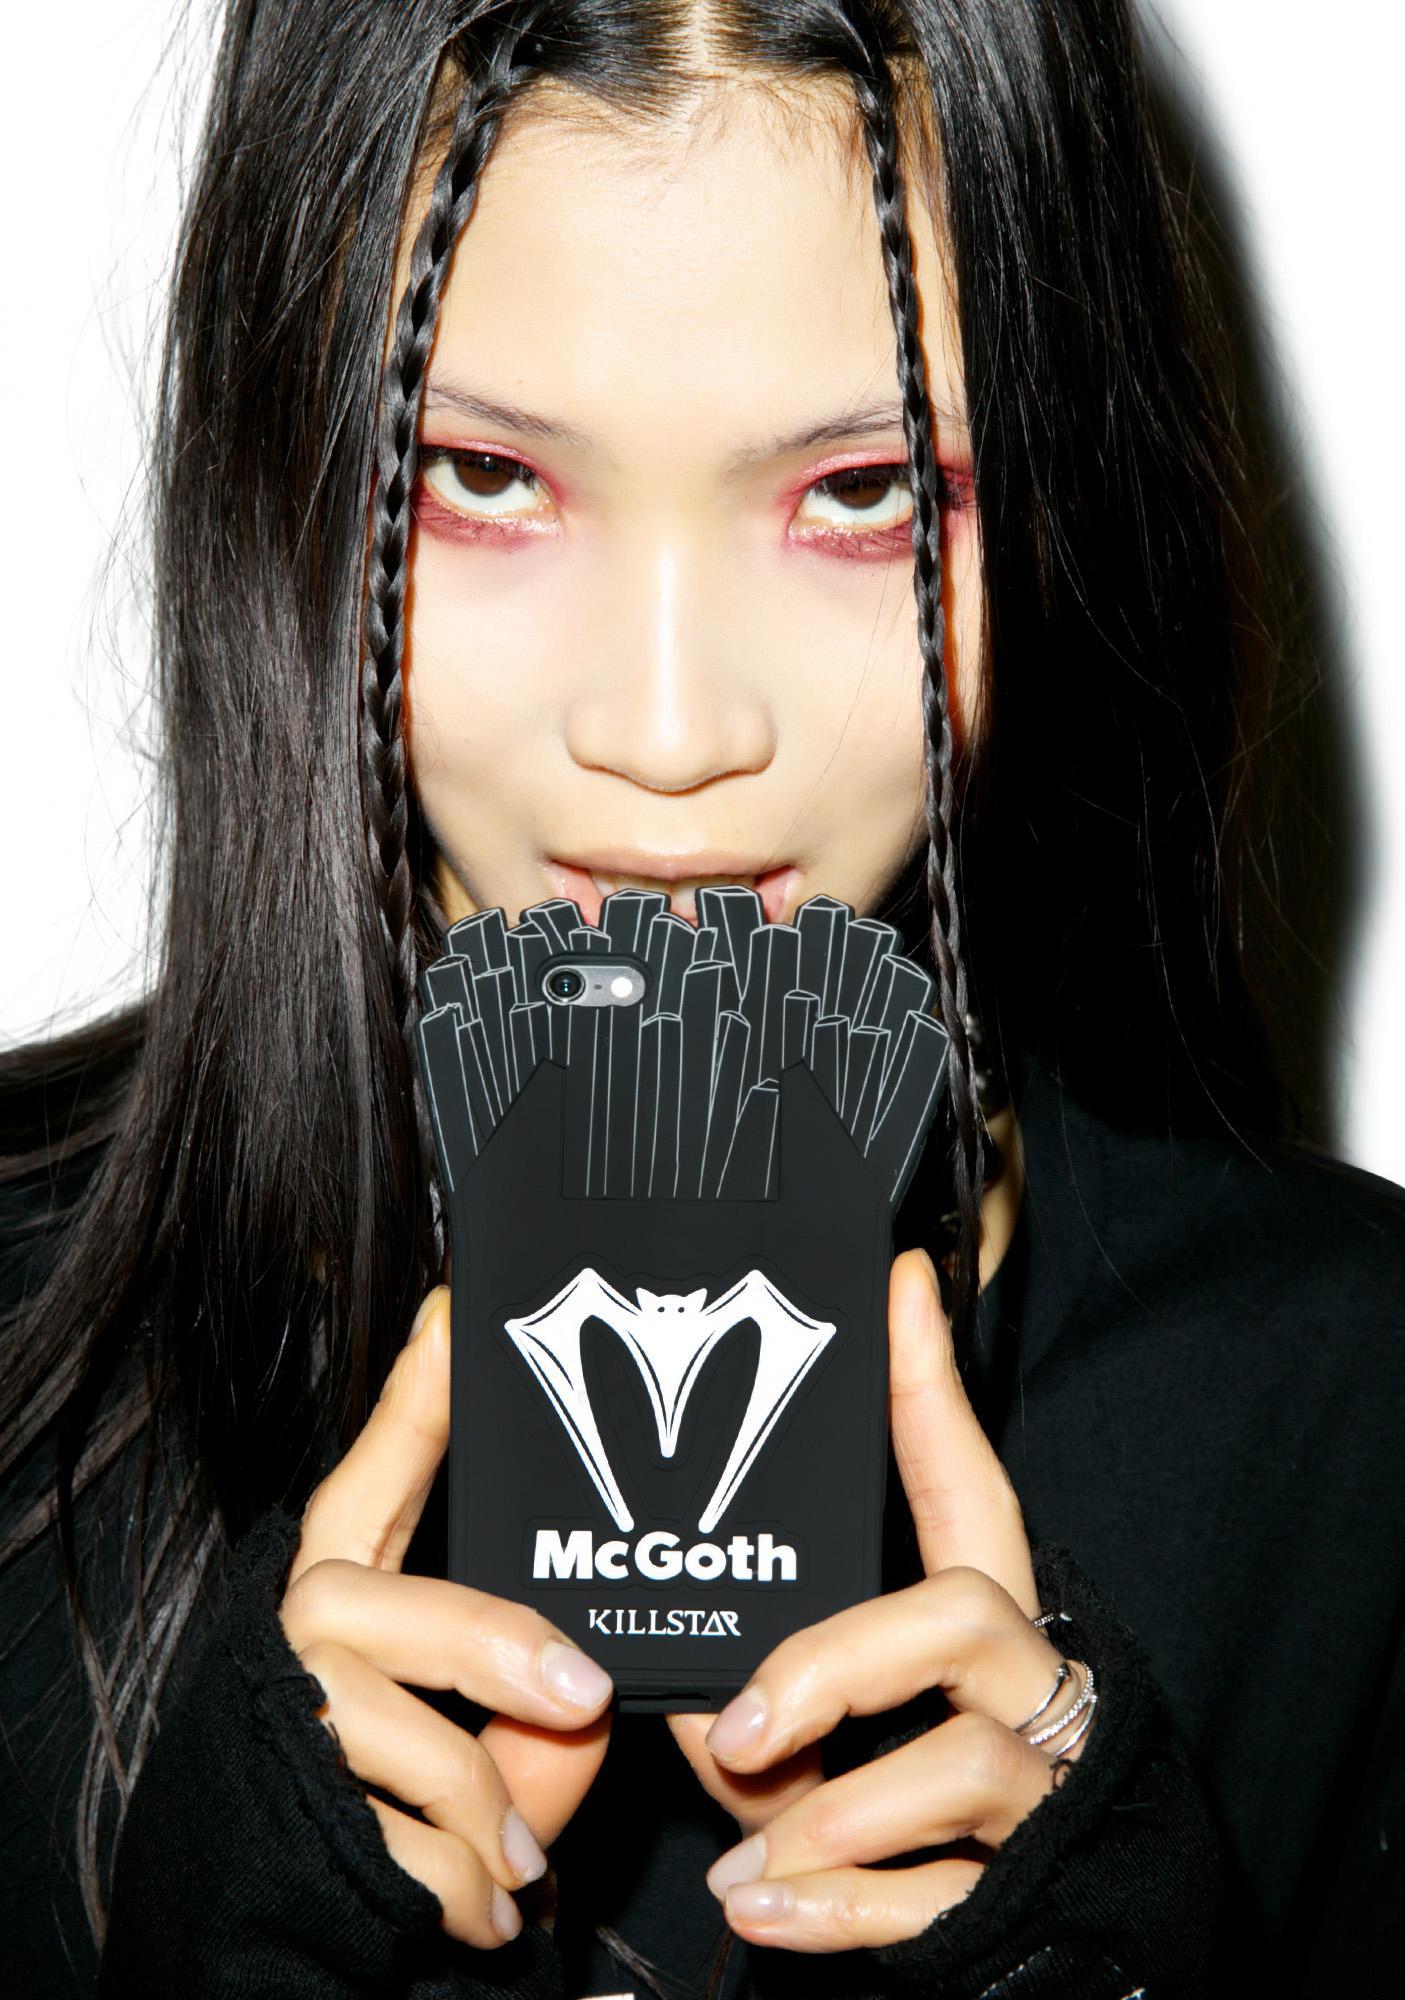 Killstar McGoth IPhone Case